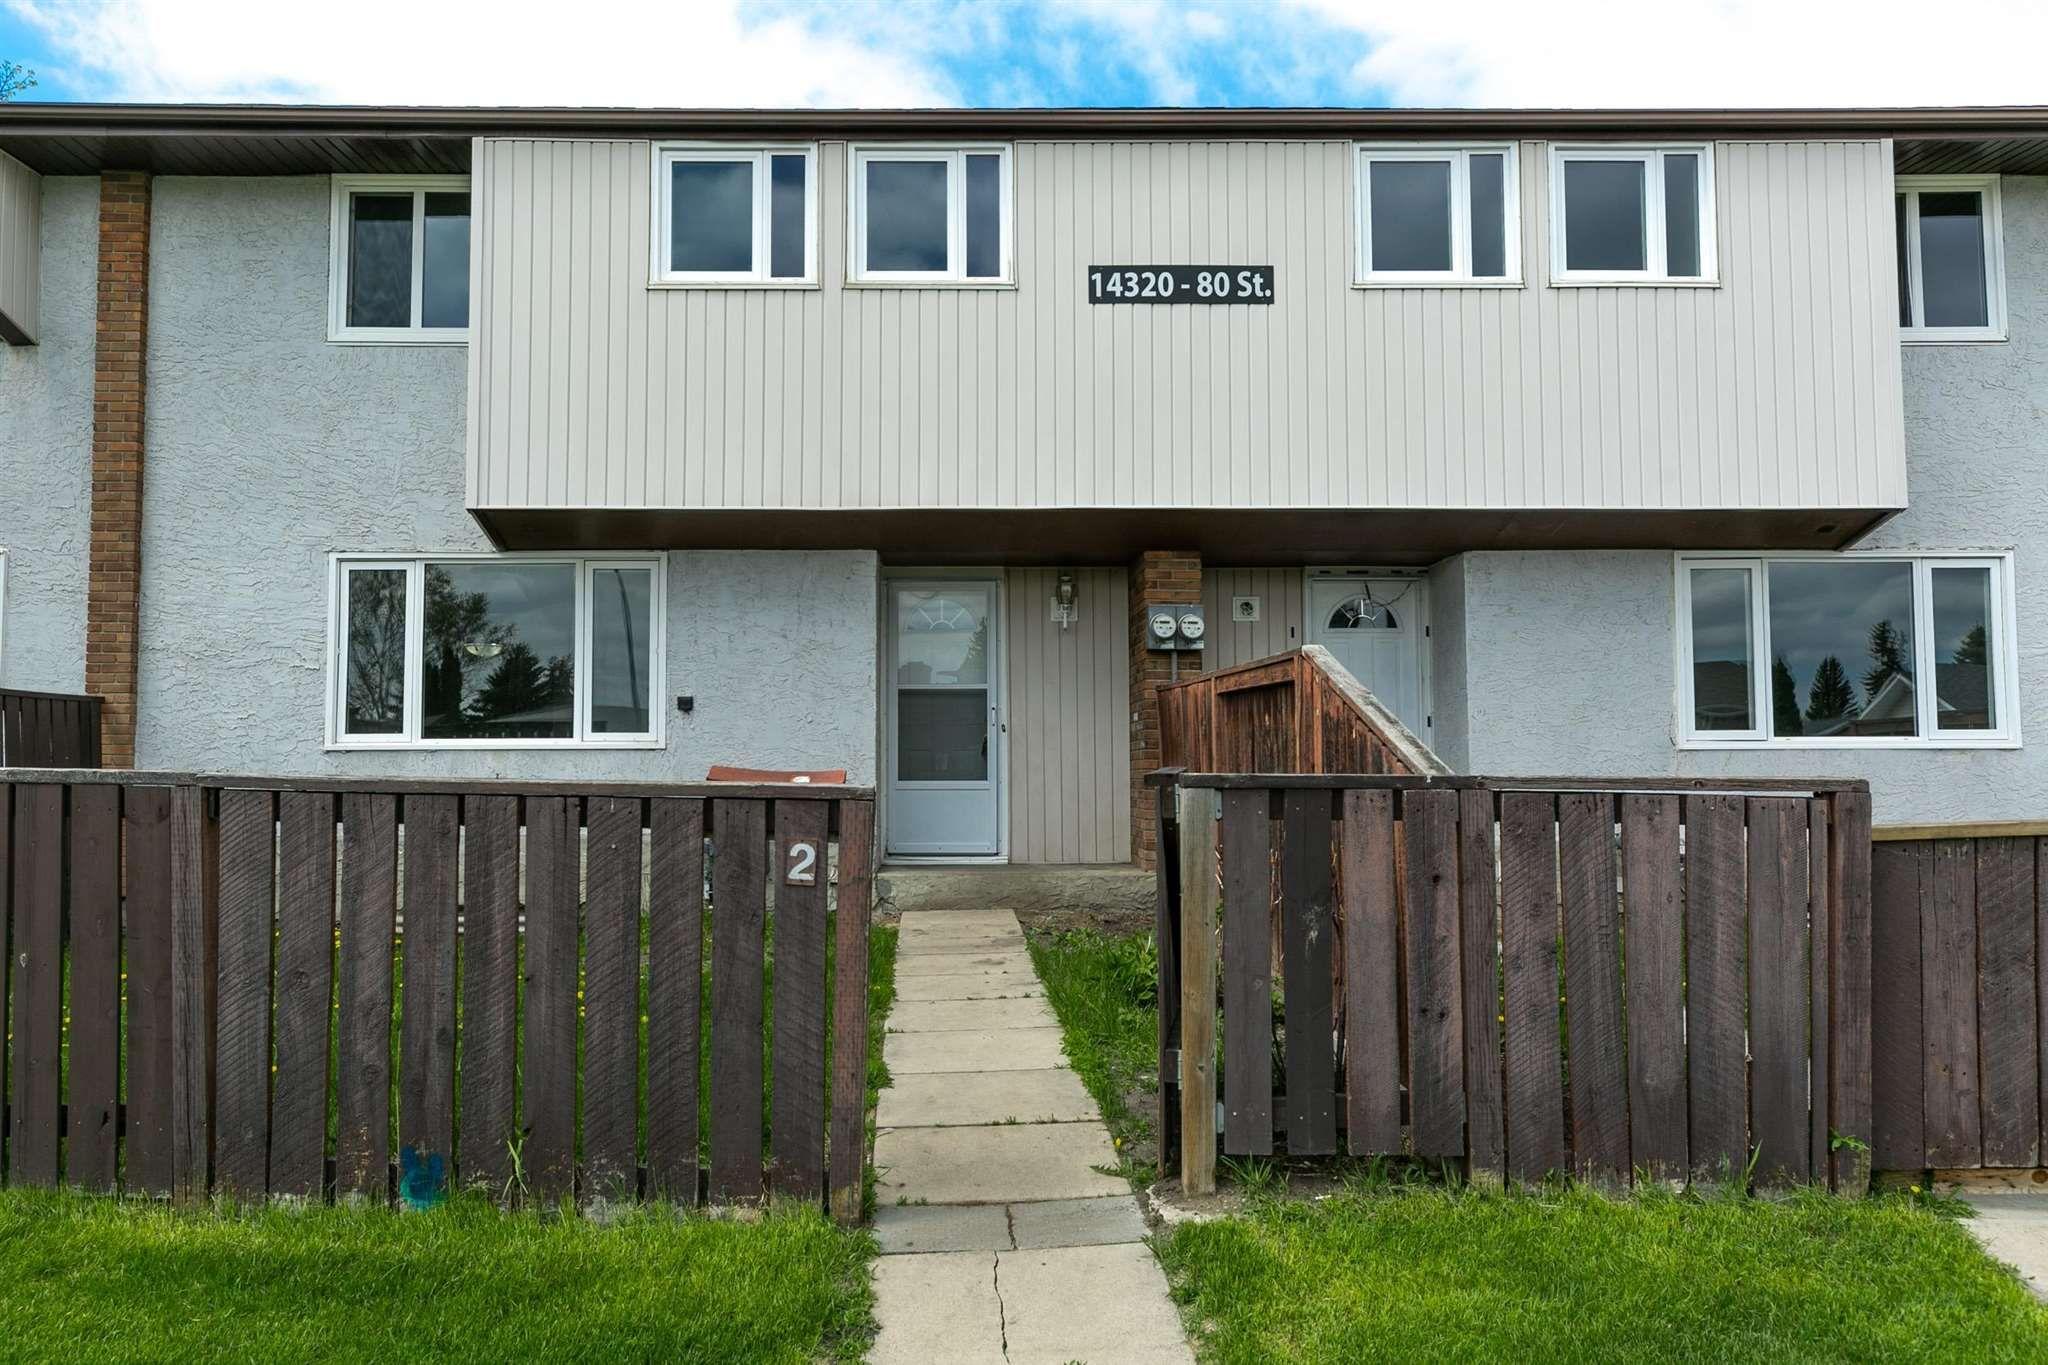 Main Photo: 2 14320 80 Street in Edmonton: Zone 02 Townhouse for sale : MLS®# E4249102